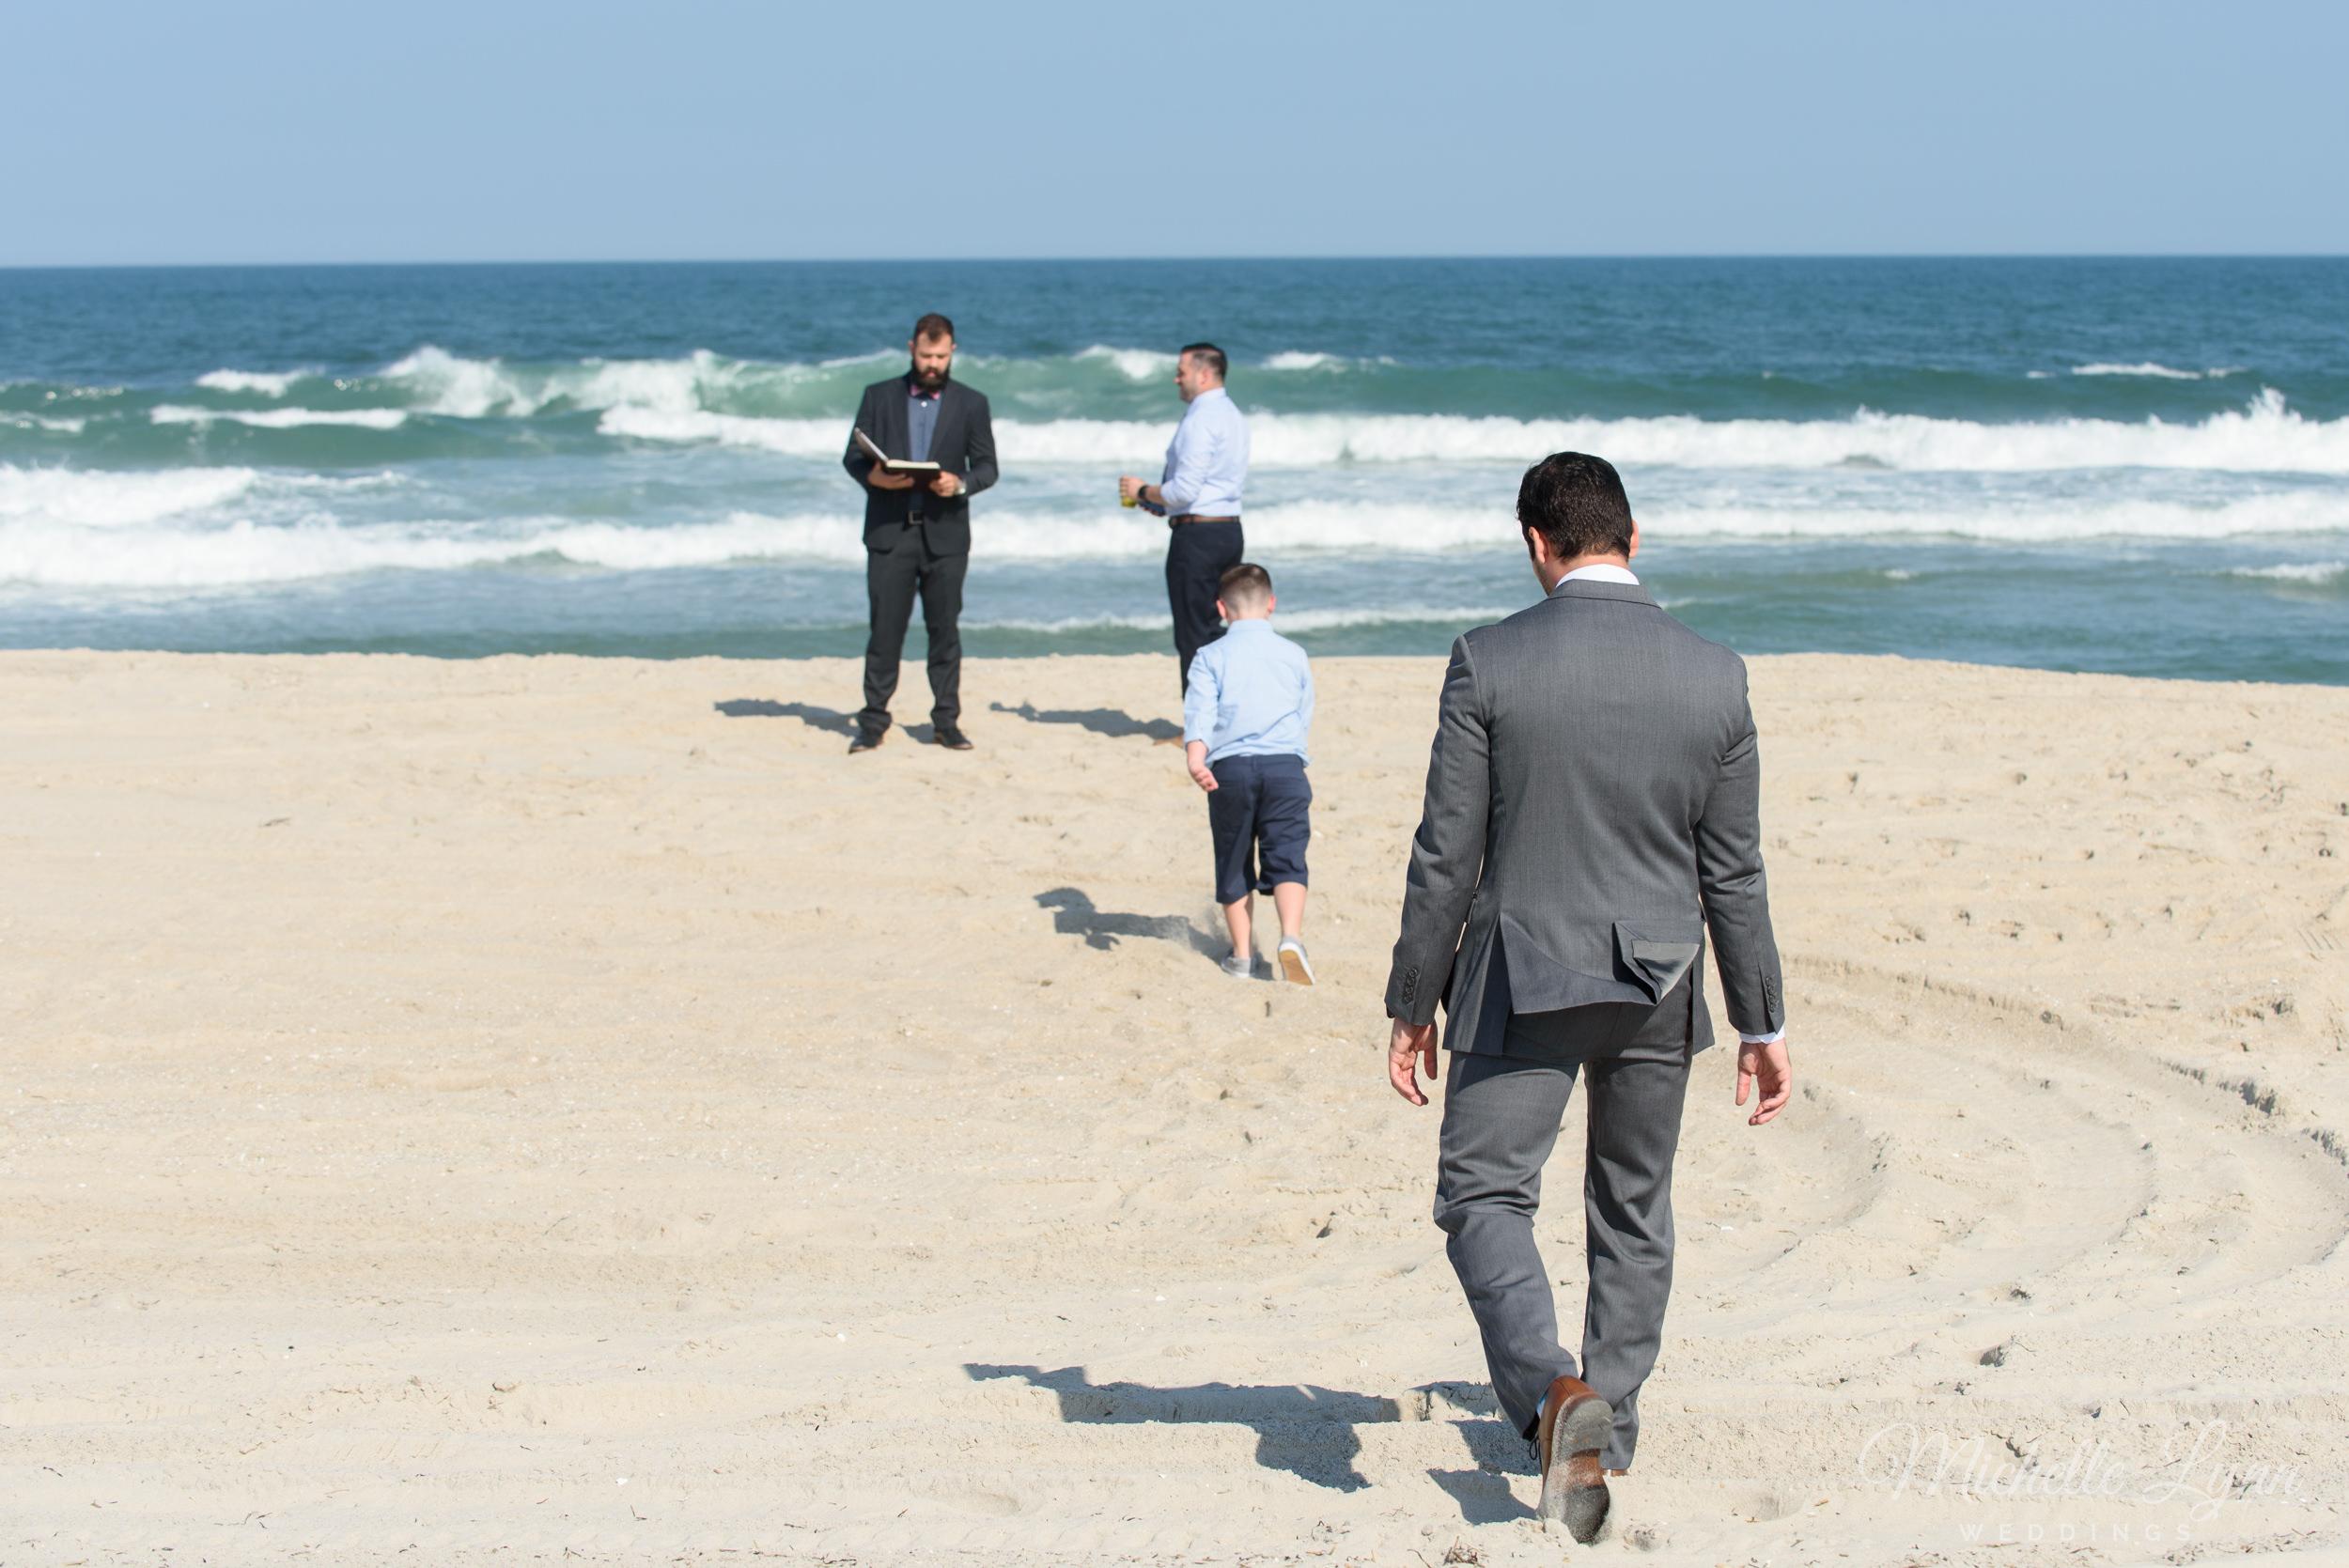 mlw-brant-beach-lbi-wedding-photography-10.jpg